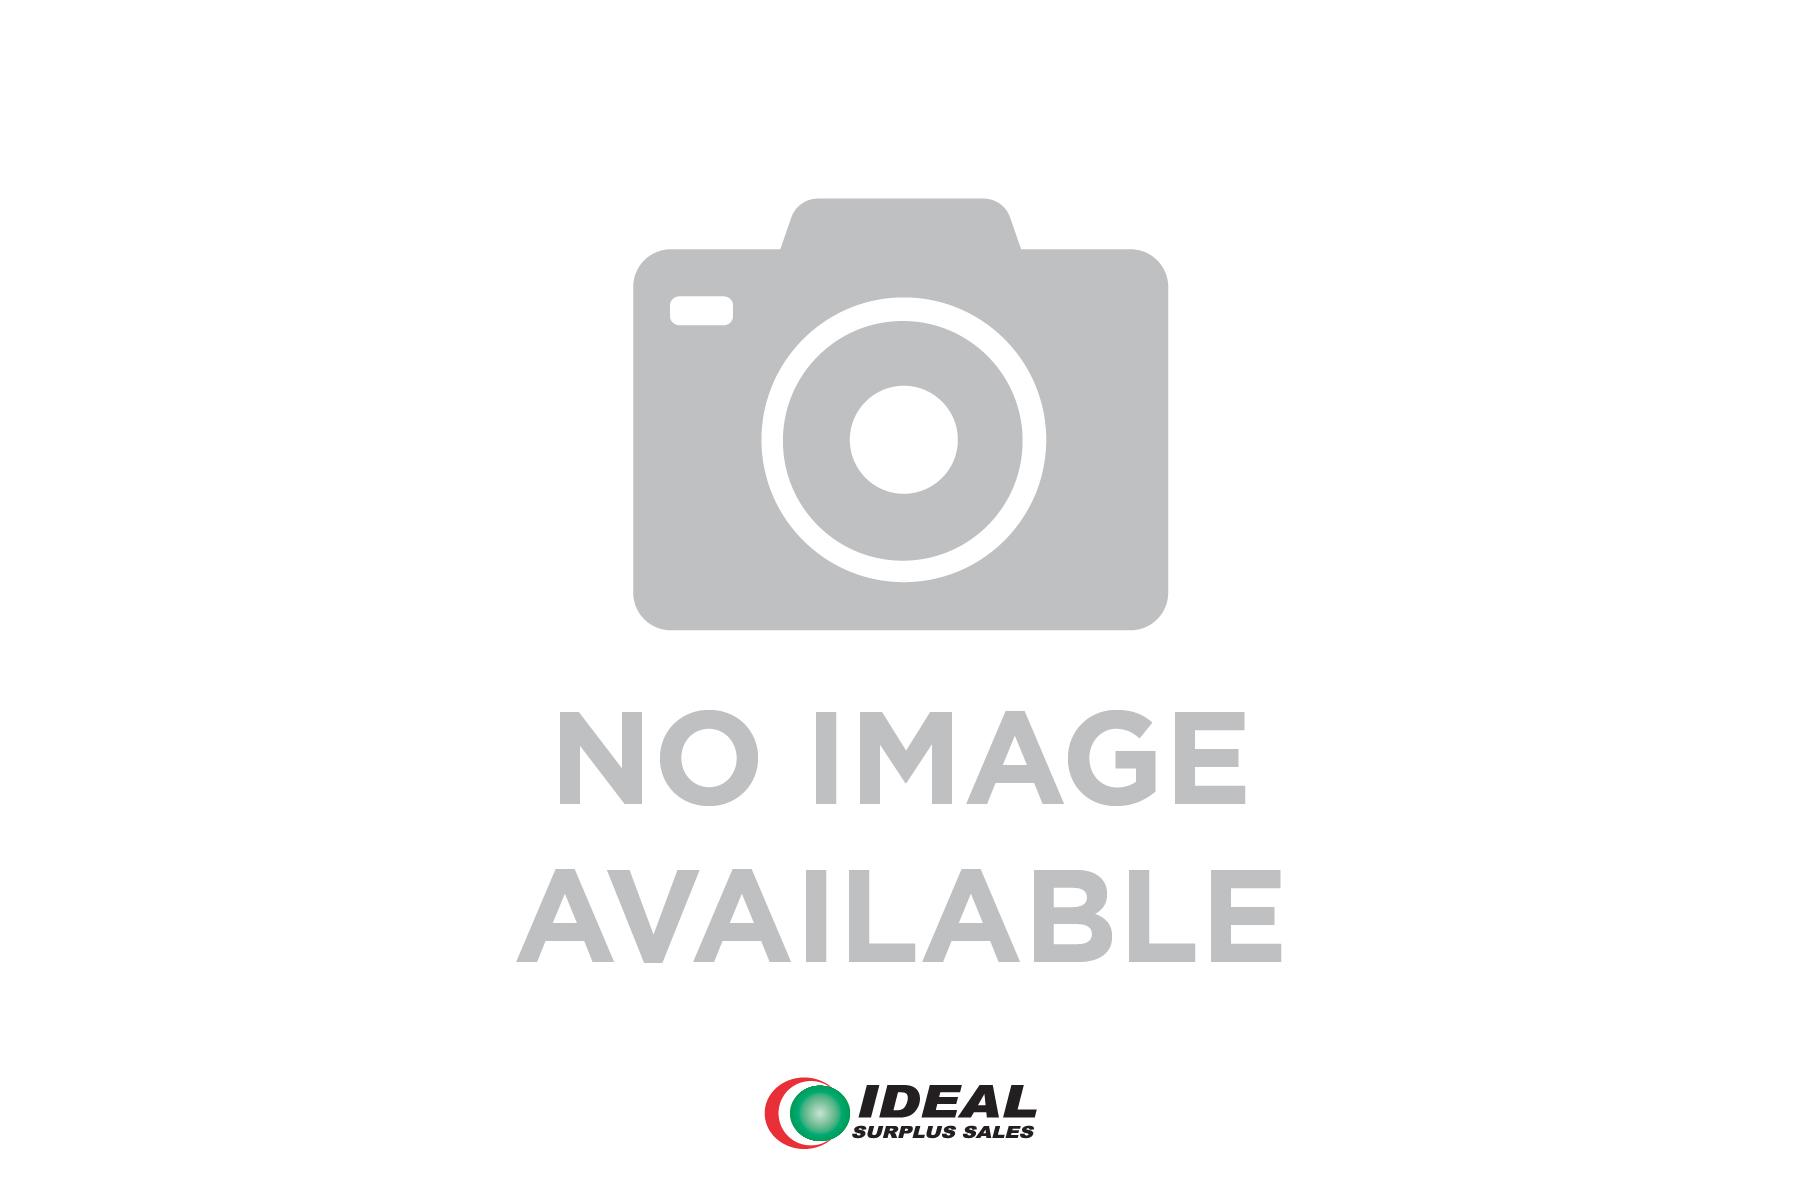 WATLOW F304304L HEATER USED